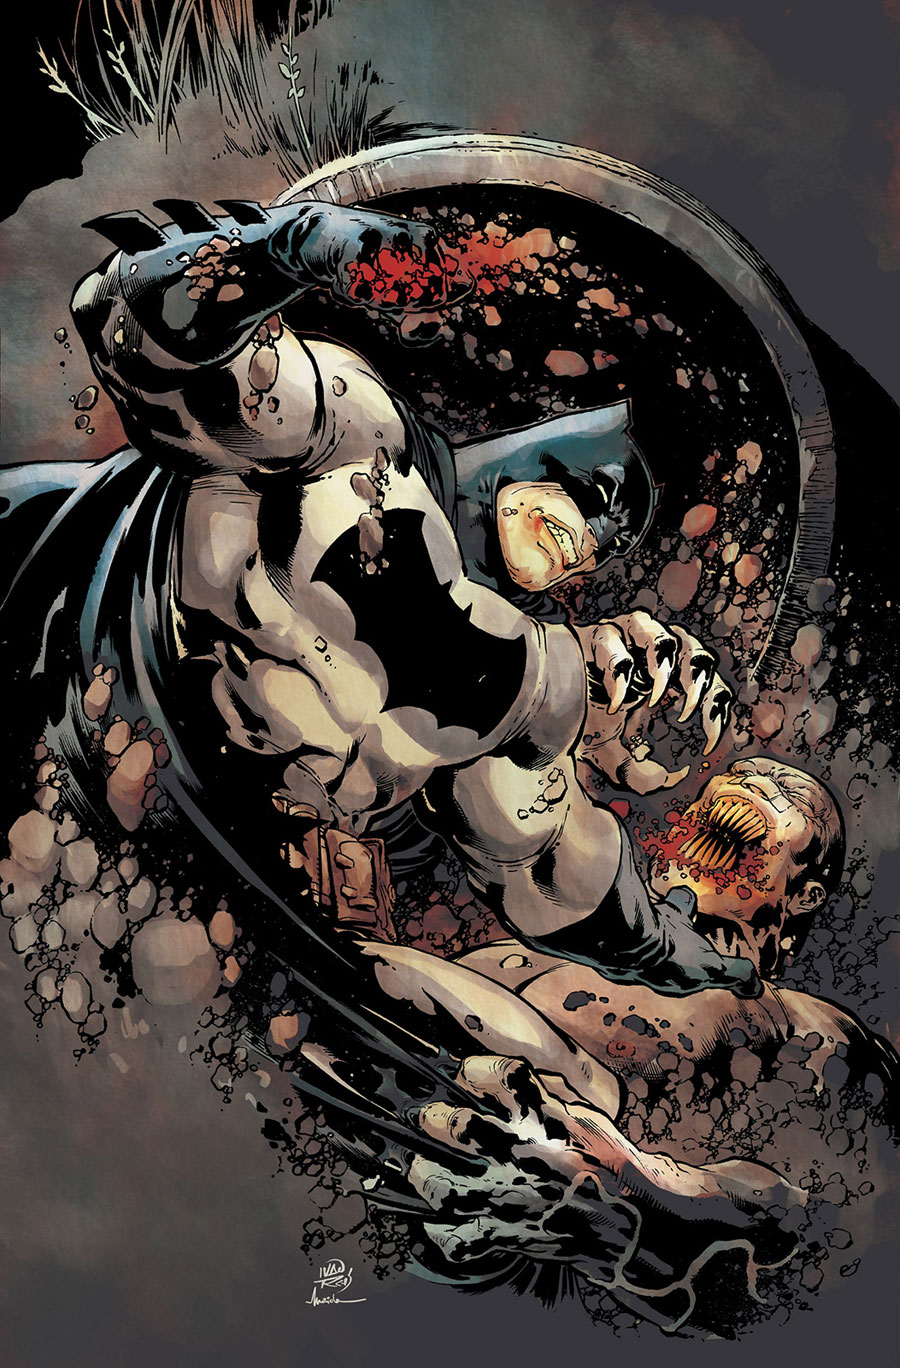 كمیك شوالیه تاریكی 3: نژاد برتر - Dark Knight III: The Master Race